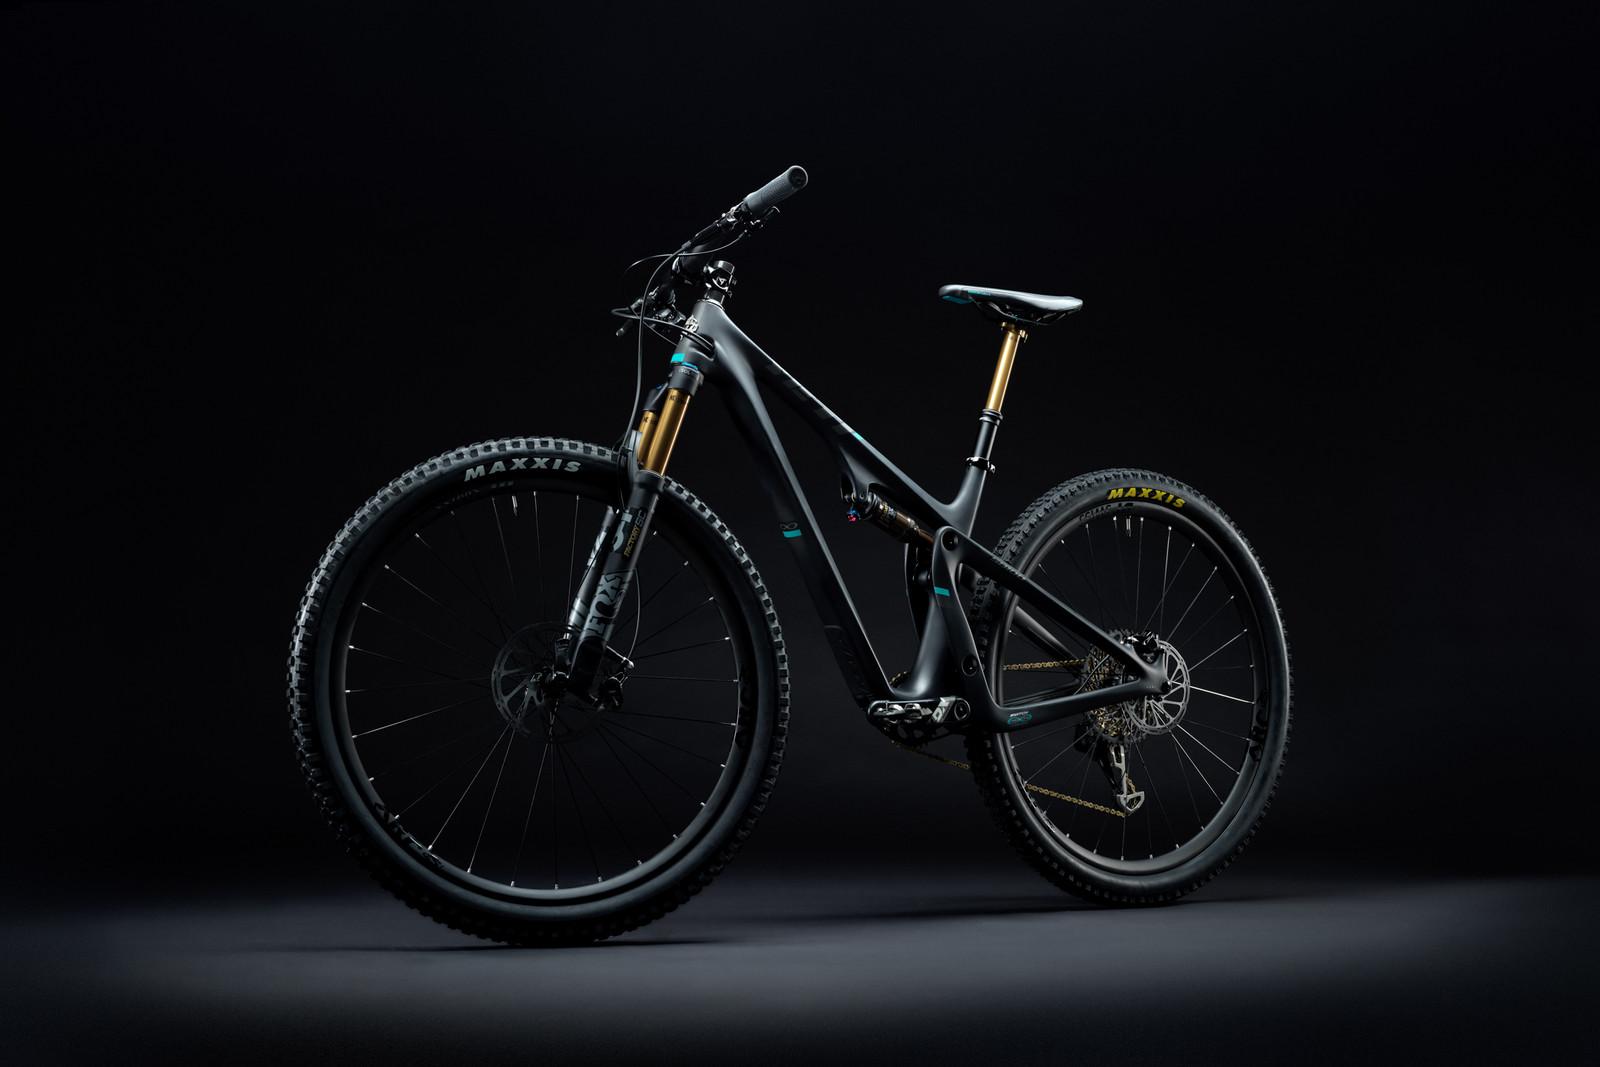 2019 Yeti SB100 TURQ XX1 Eagle - Reviews, Comparisons, Specs